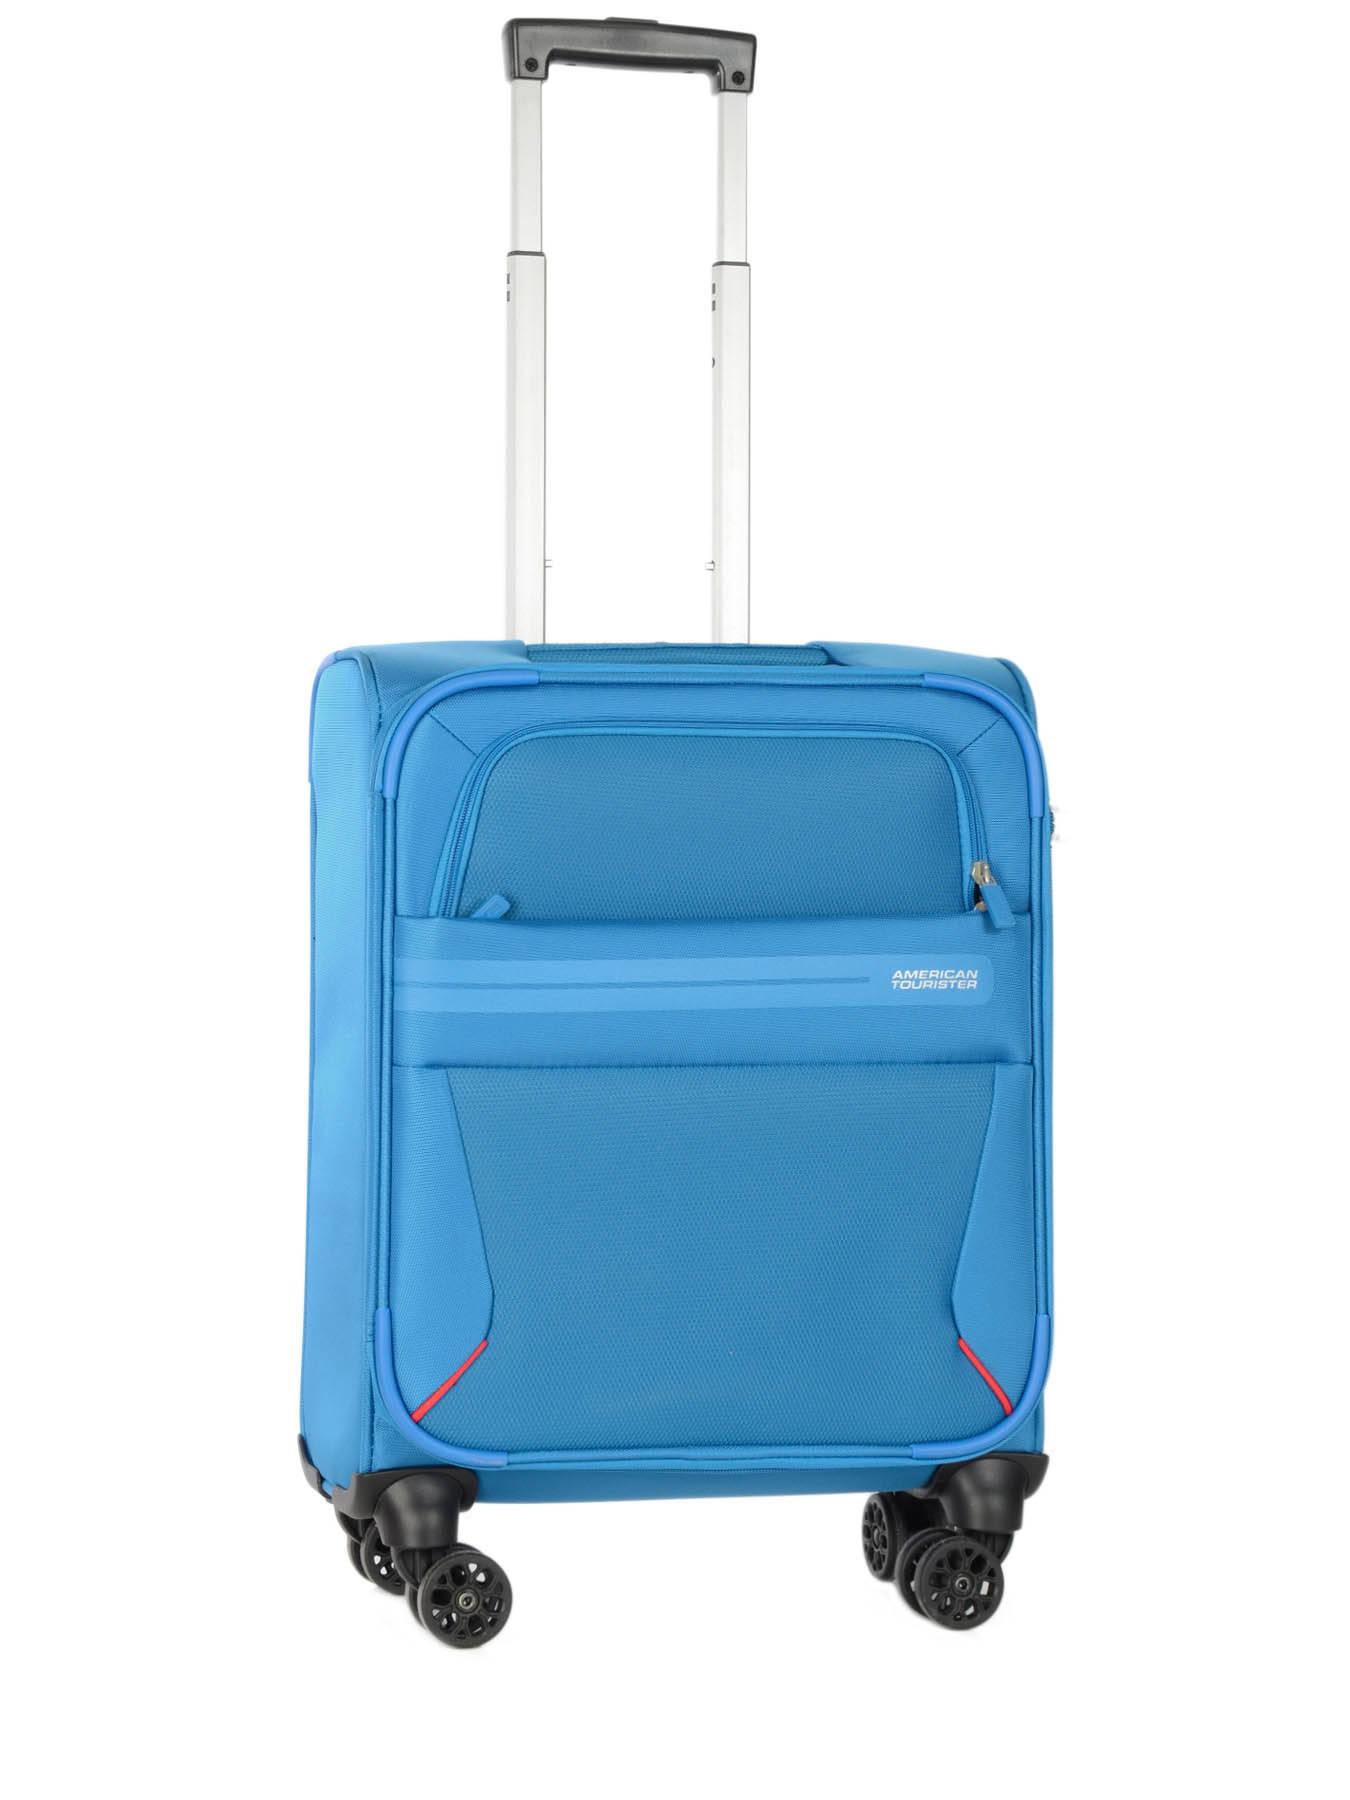 valise cabine american tourister 85459 deep blue en vente au meilleur prix. Black Bedroom Furniture Sets. Home Design Ideas